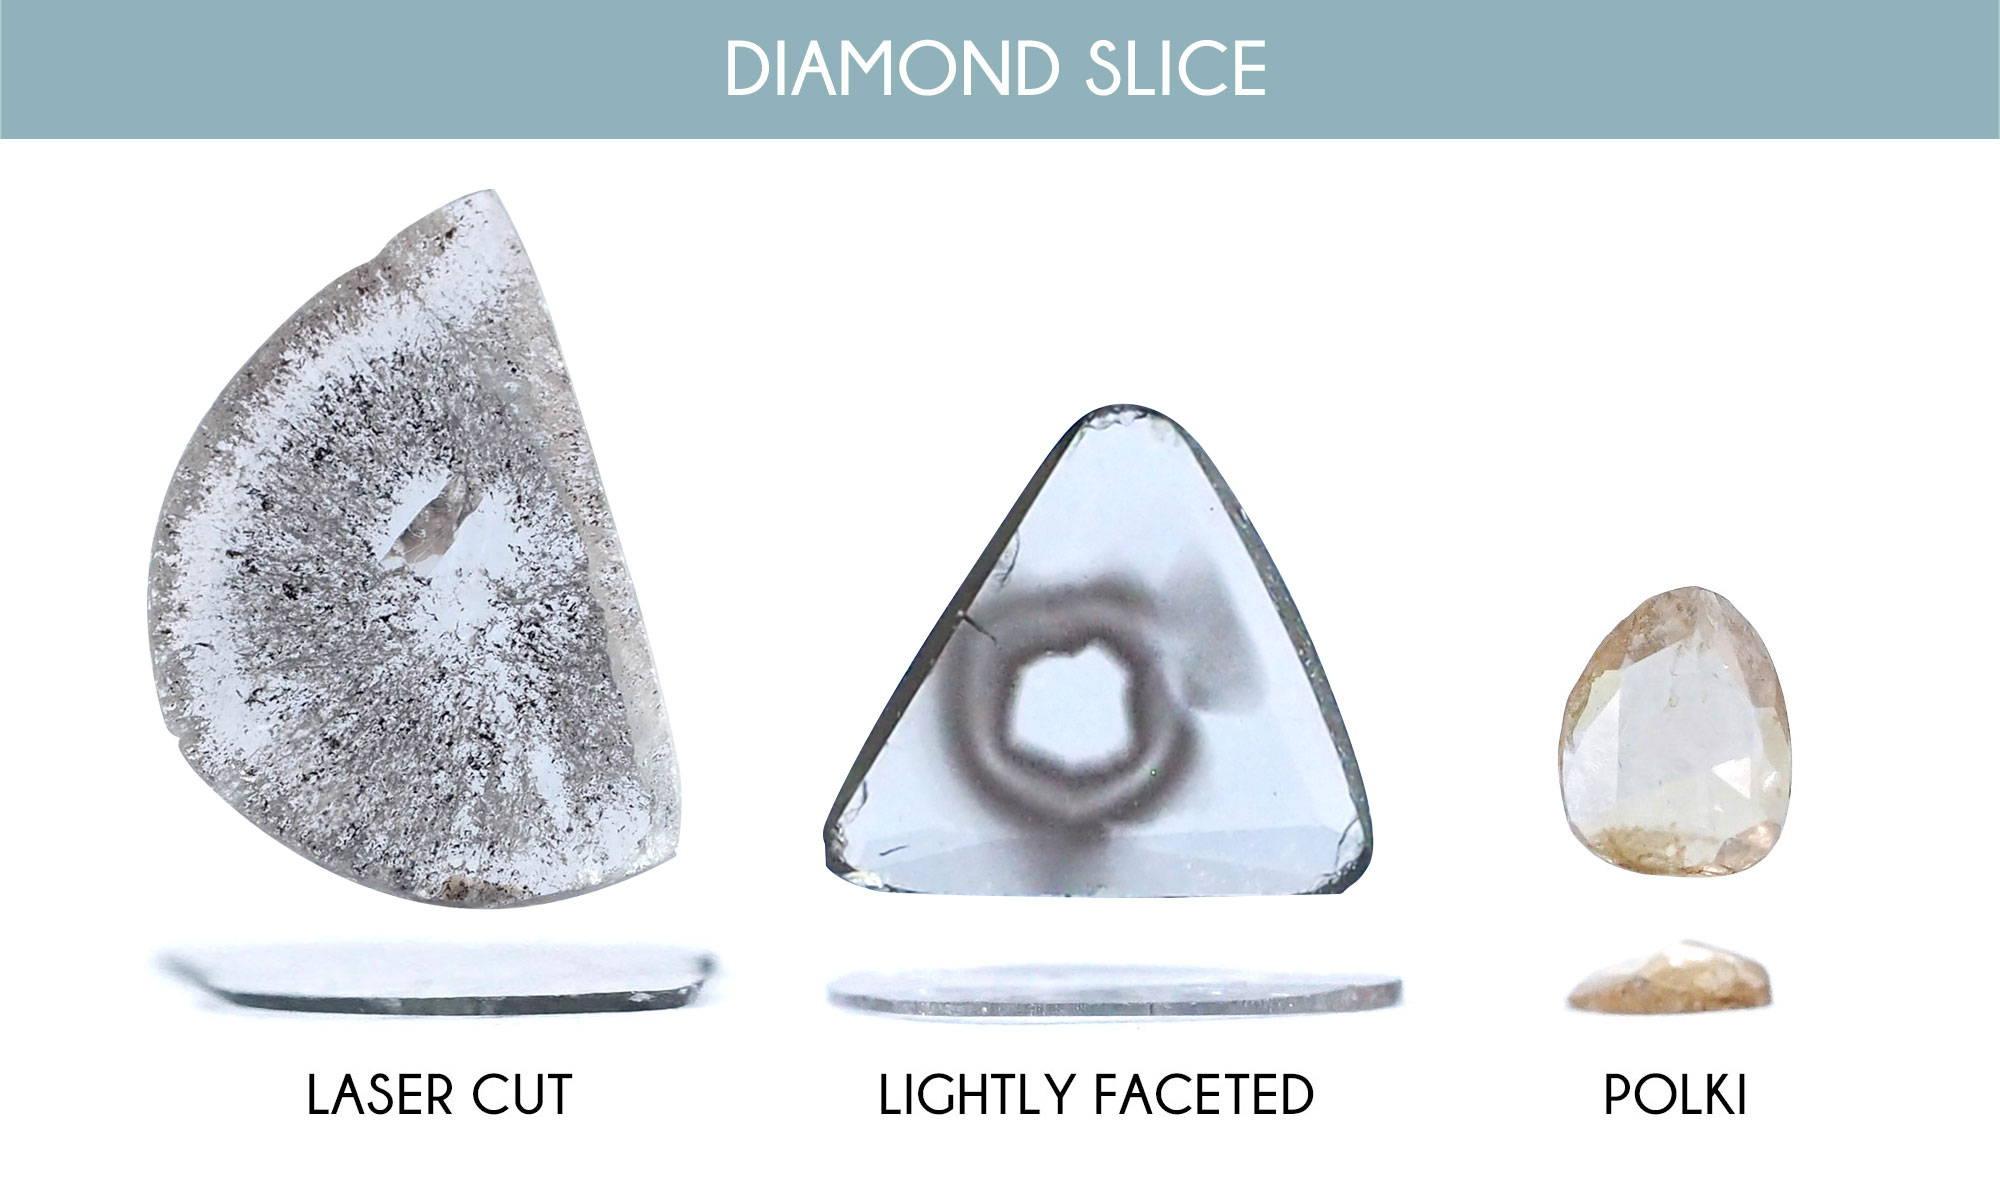 Three different looks serveed up by sliced diamonds.